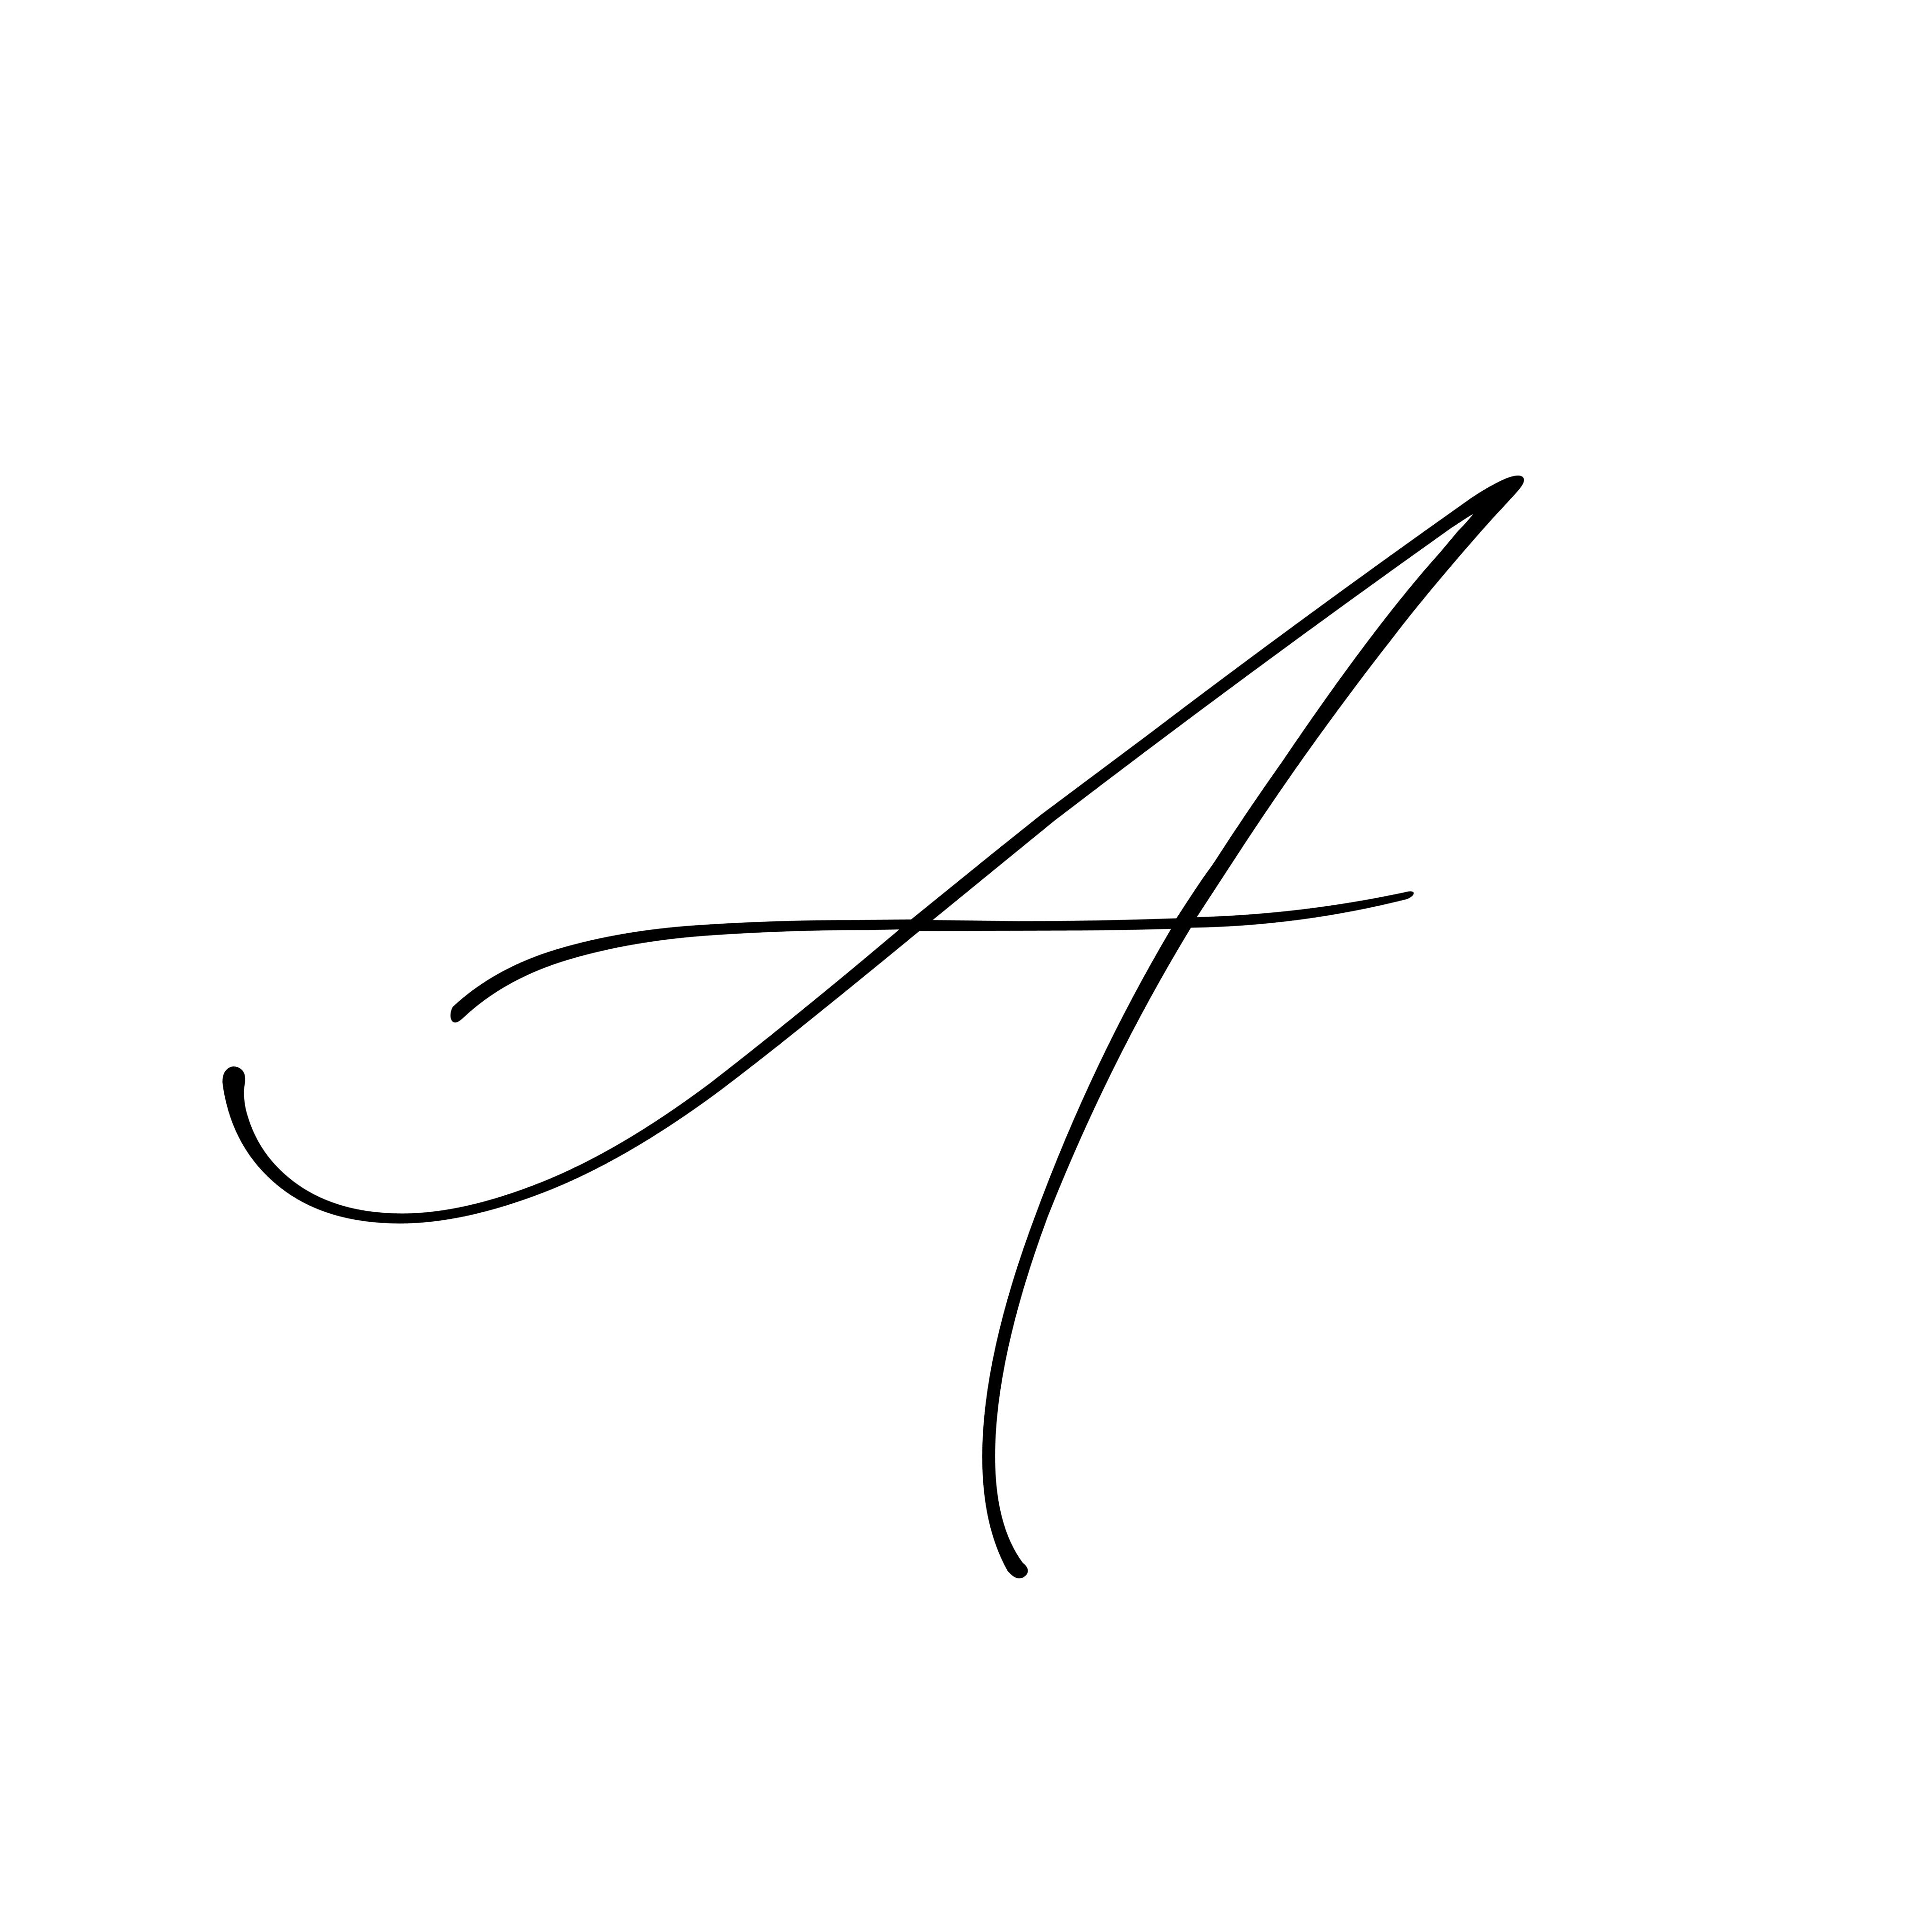 Astrids papper